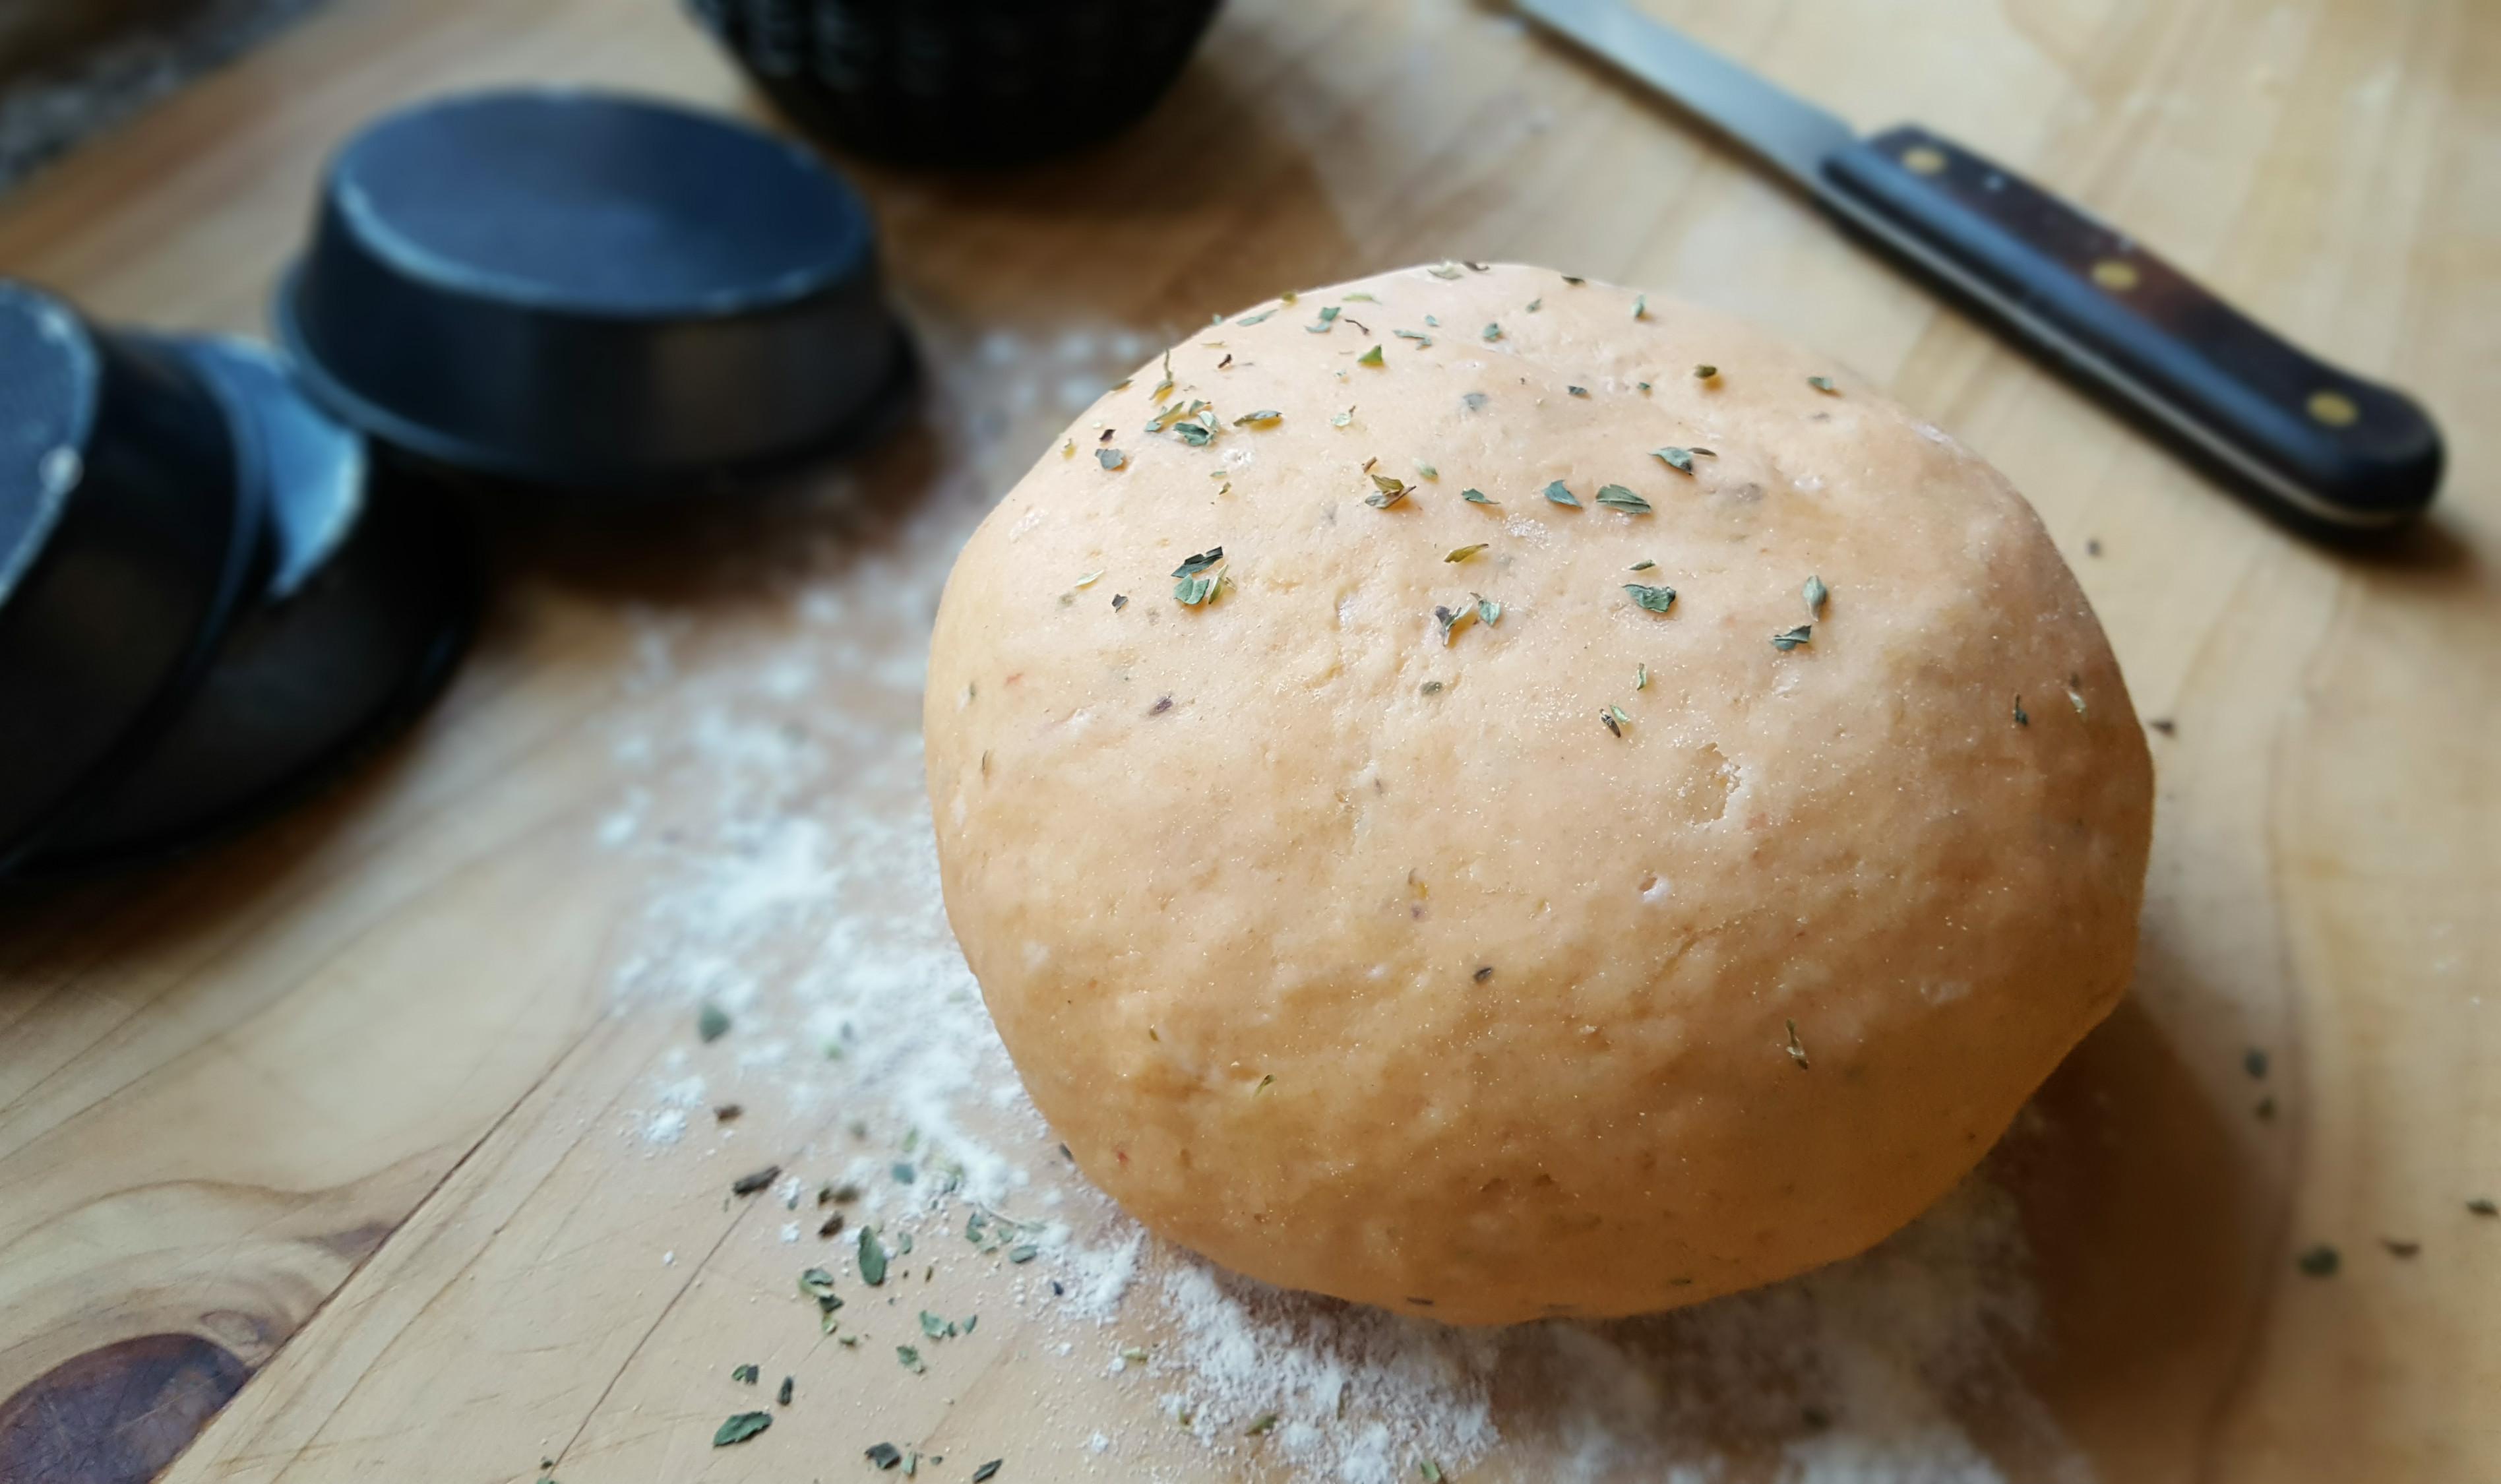 Pasta brisée alla mediterranea